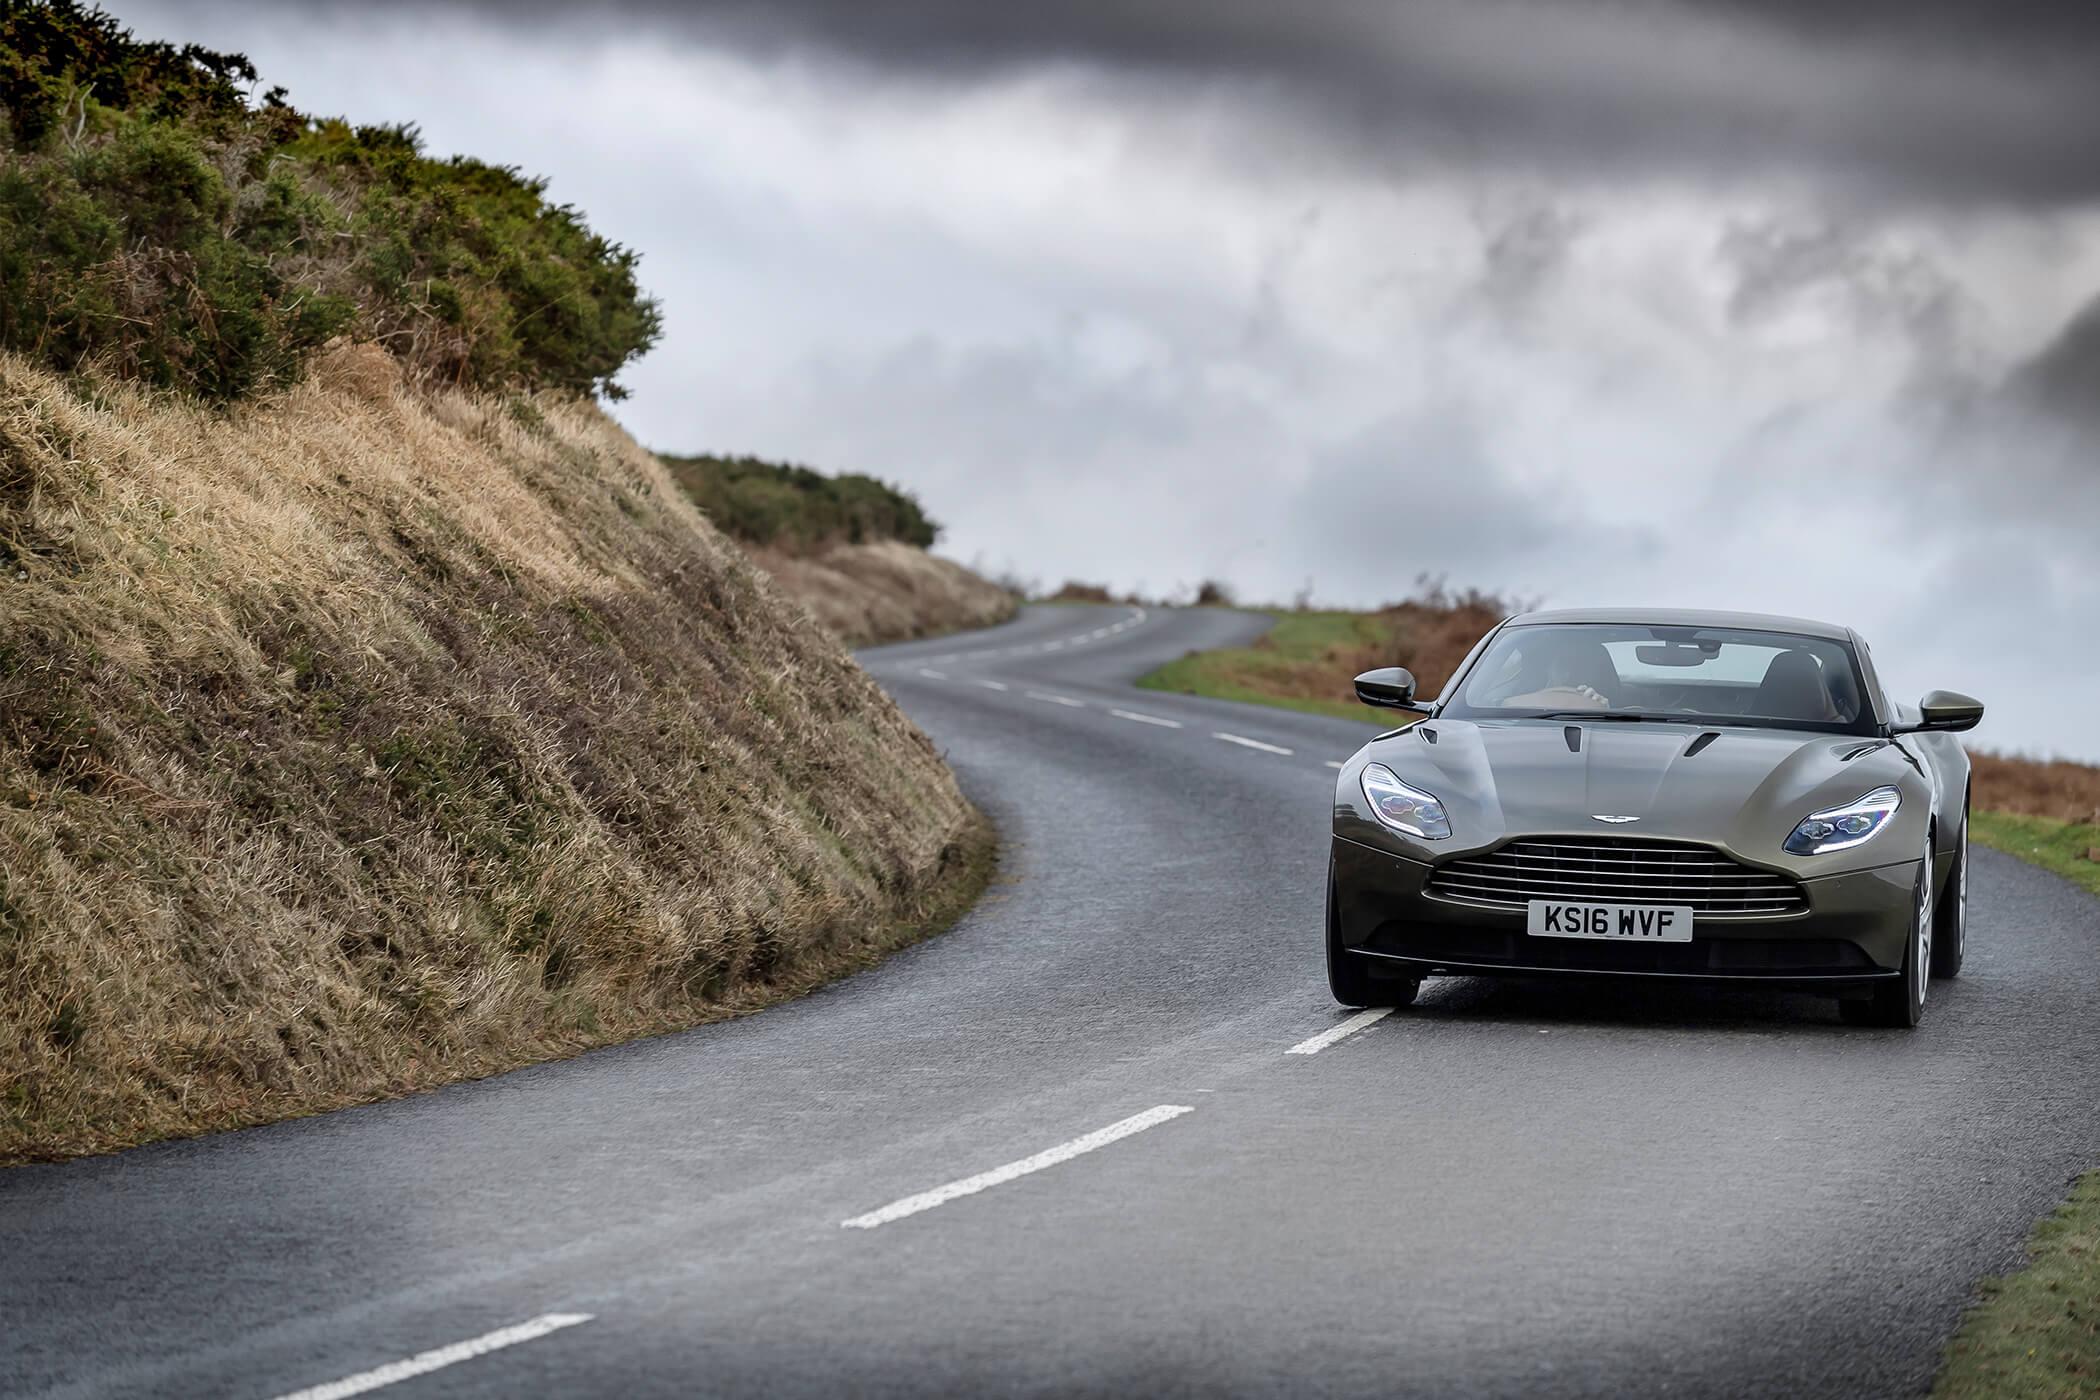 Aston Martin Highlands